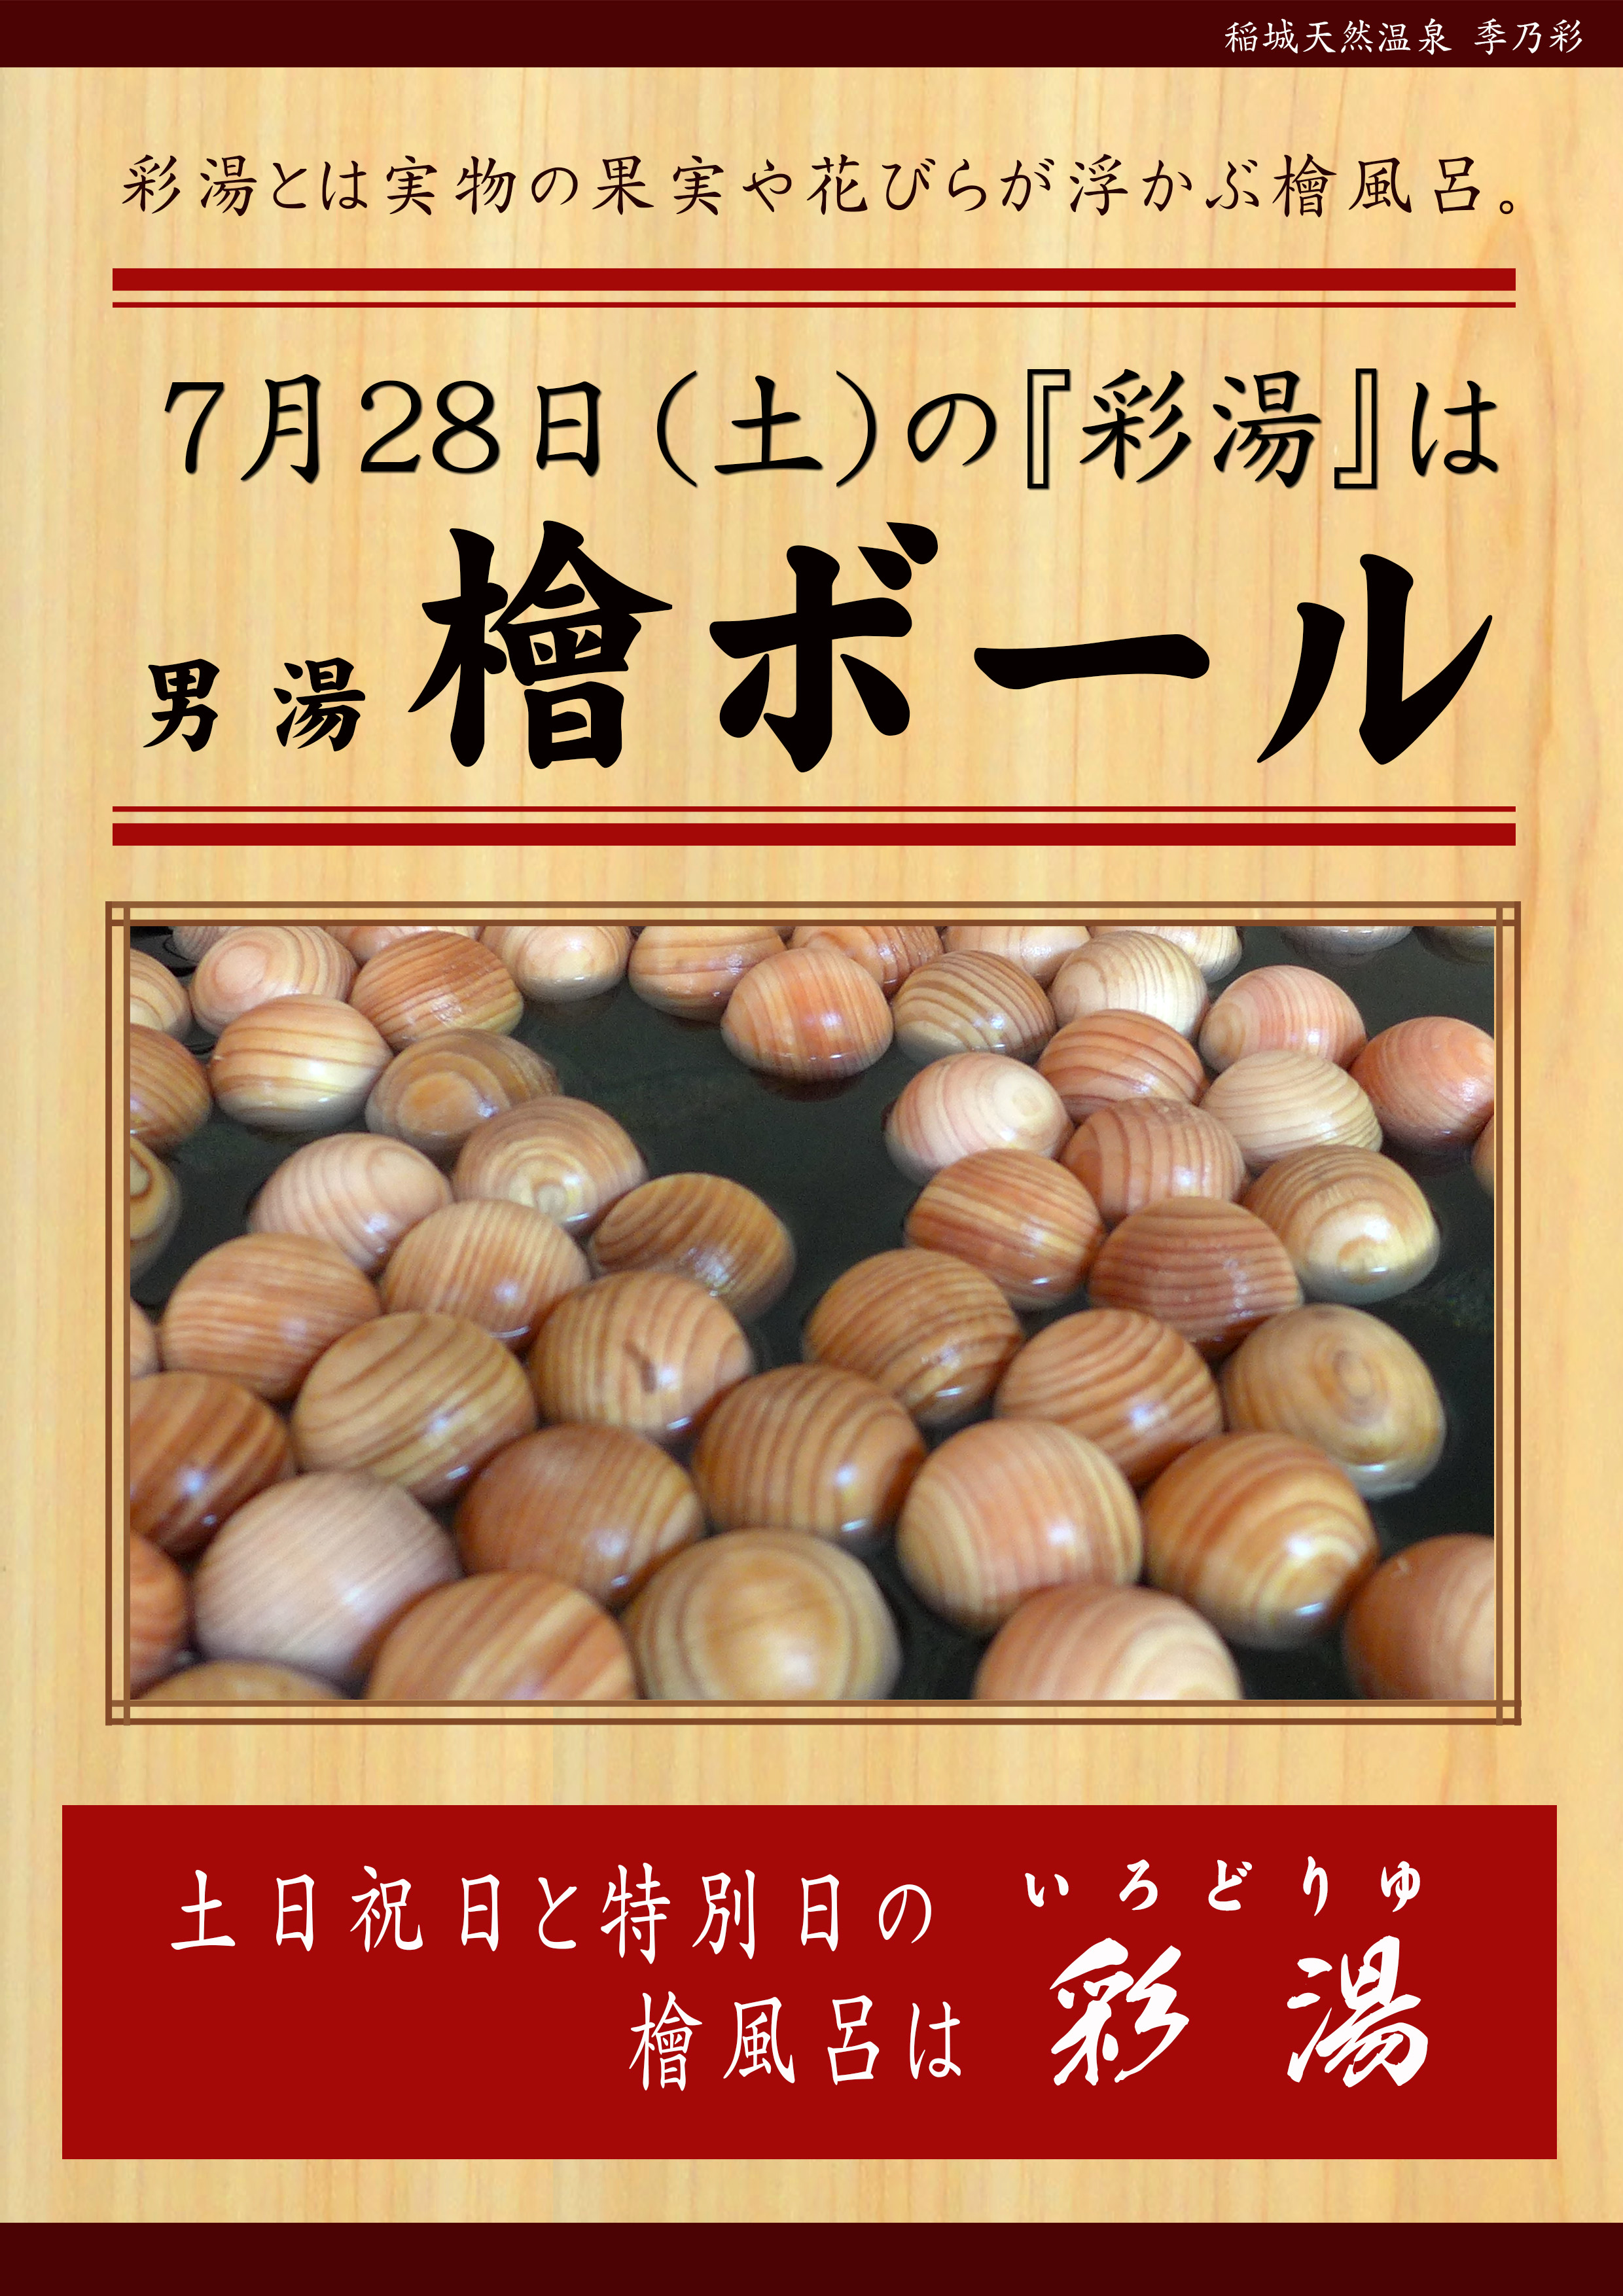 20180728POP イベント 彩湯 男湯 檜ボール